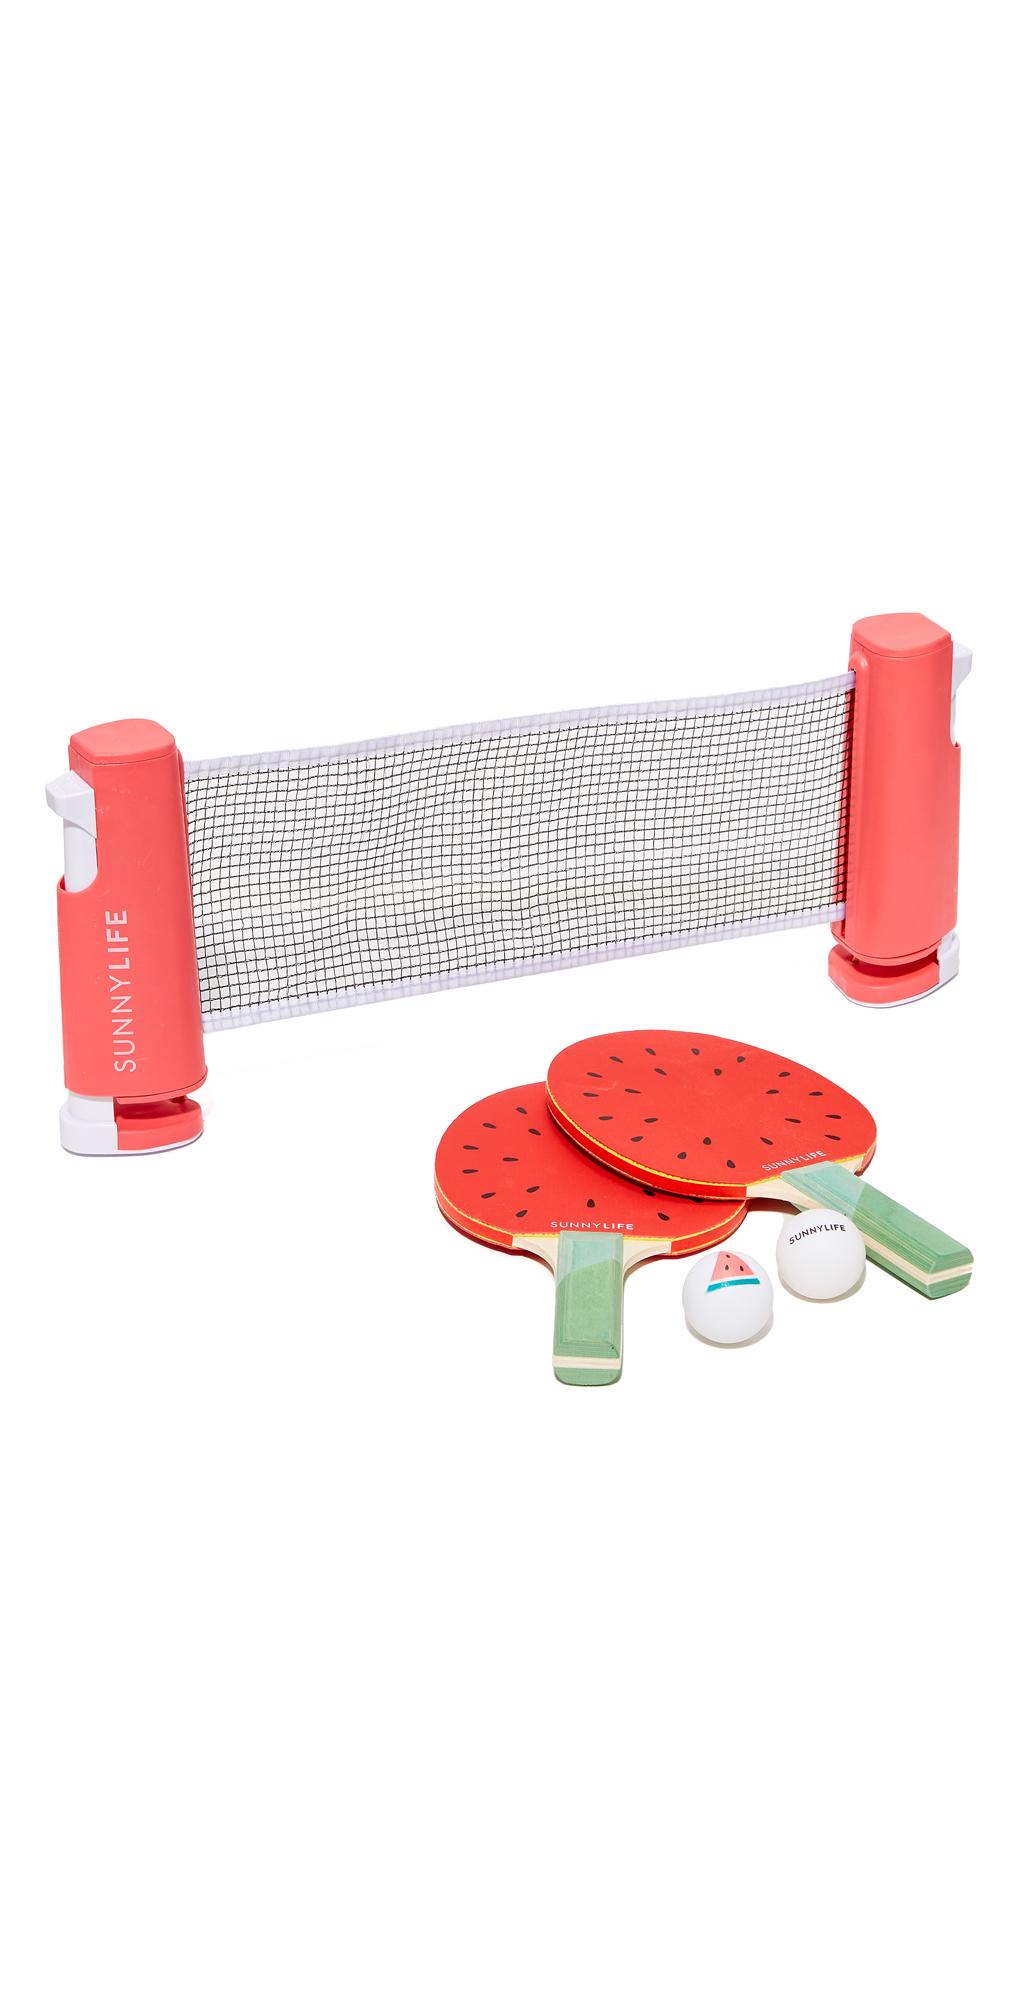 Watermelon Ping Pong Set SunnyLife